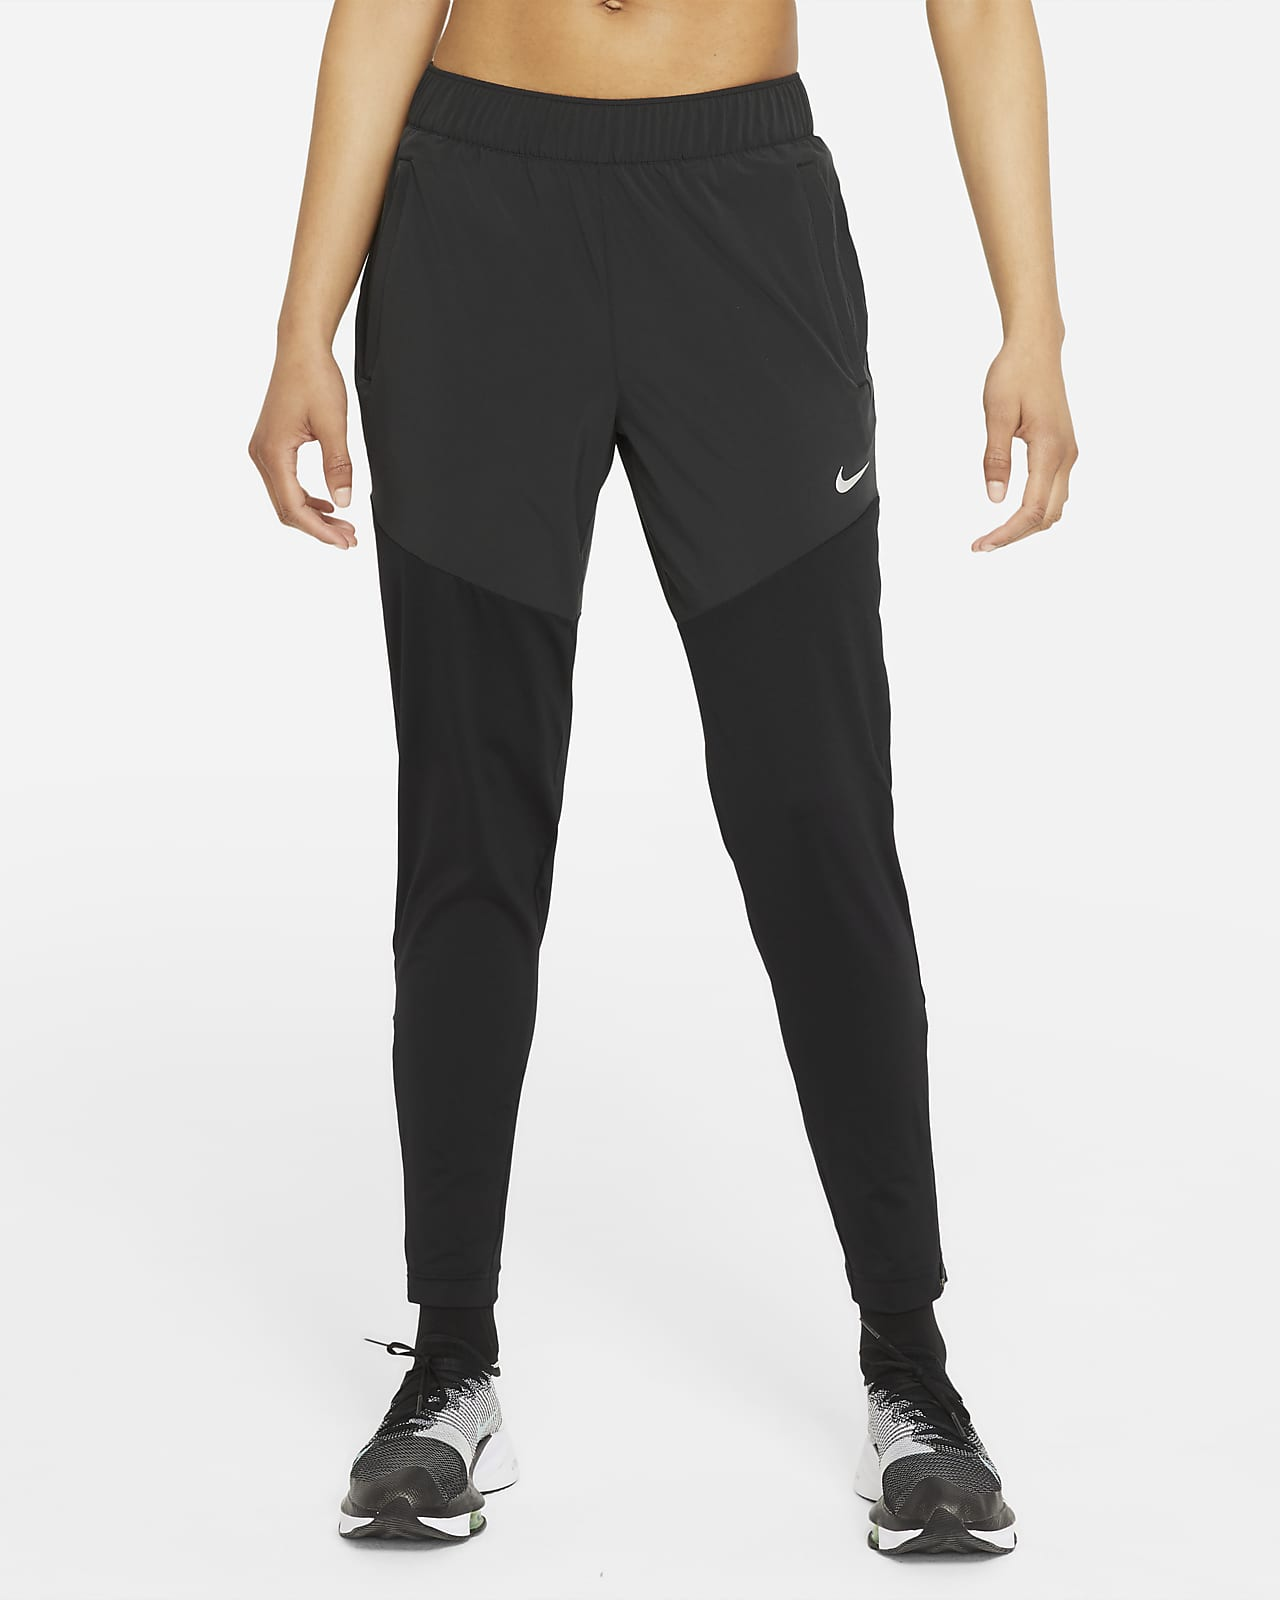 Nike Dri-FIT Essential női futónadrág